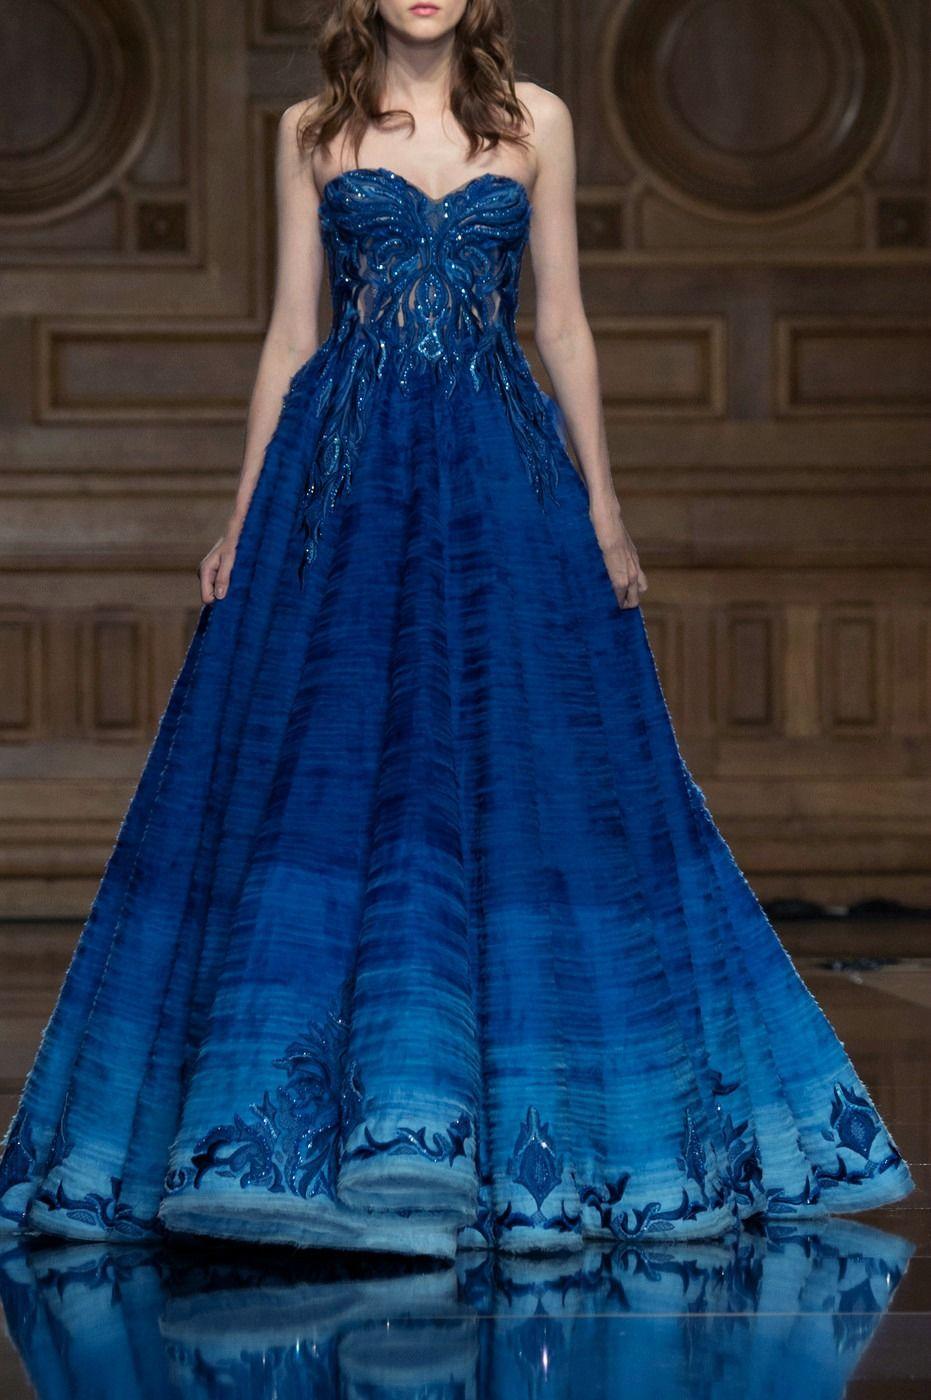 Josephinetony ward haute couture fw art costume insp